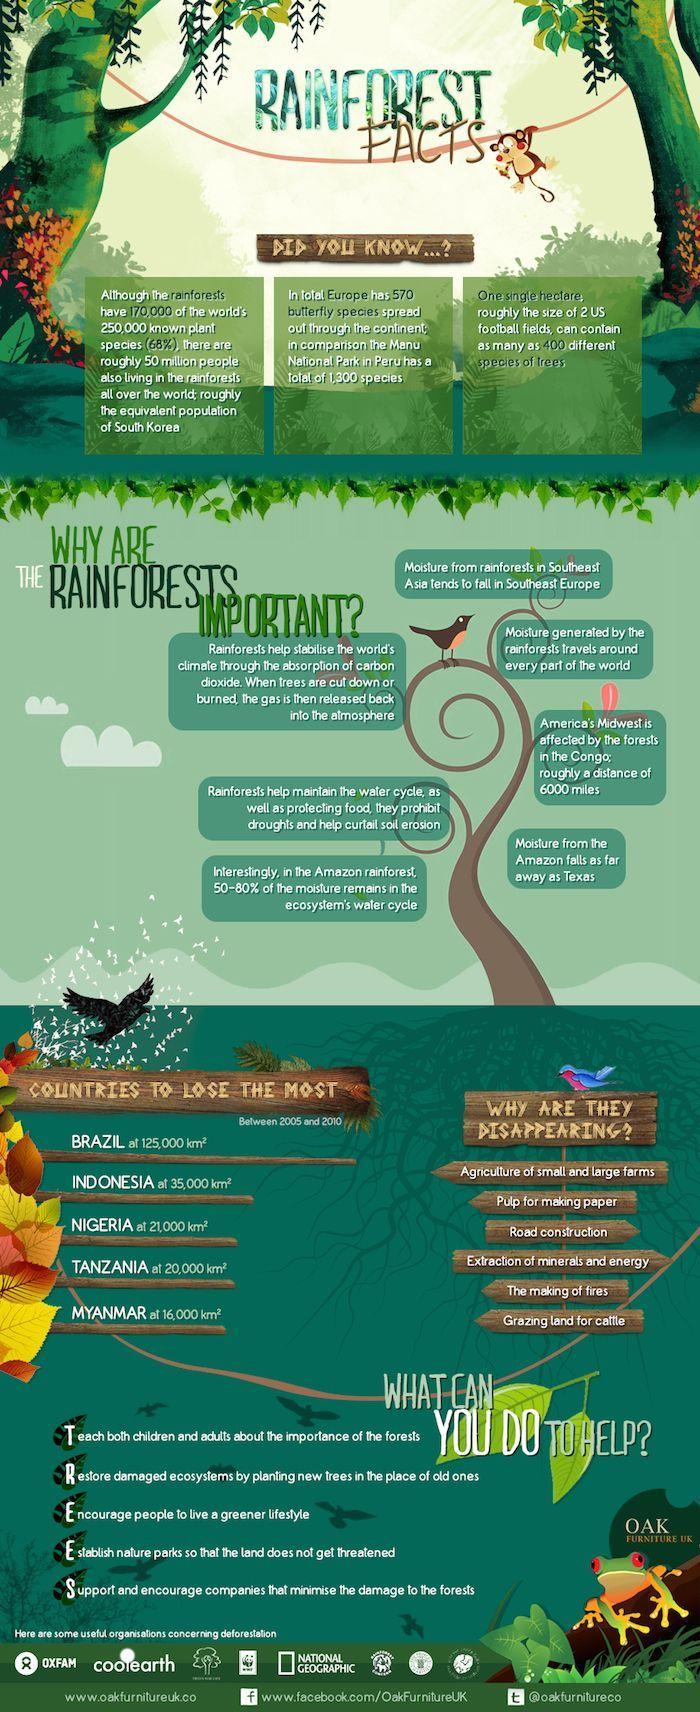 Rainforest Facts Infographic , Rainforest Information